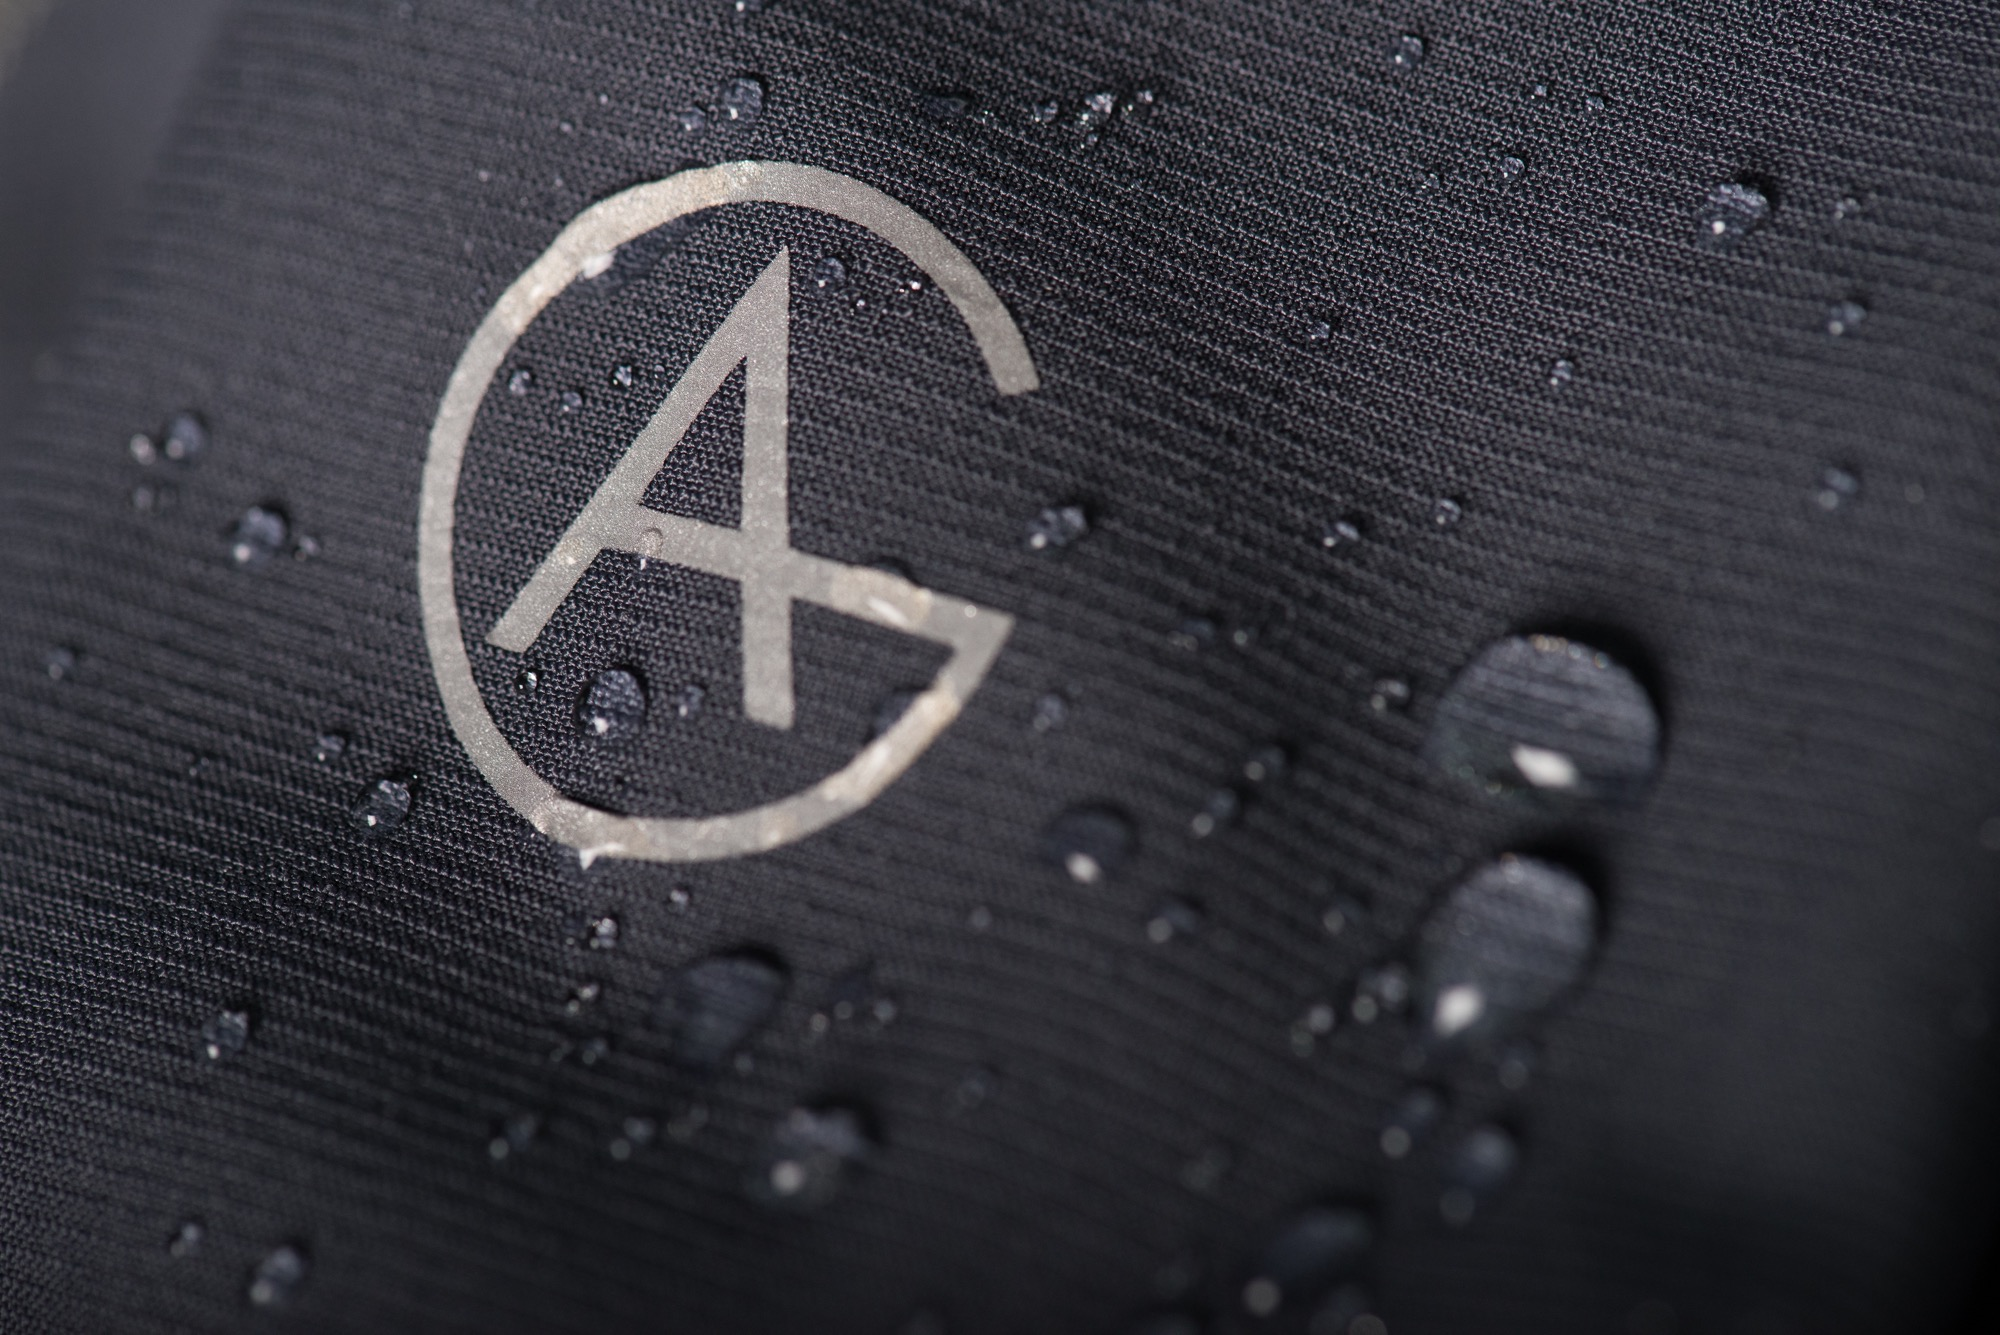 317-AegleGear-201512-DotsonCommercial